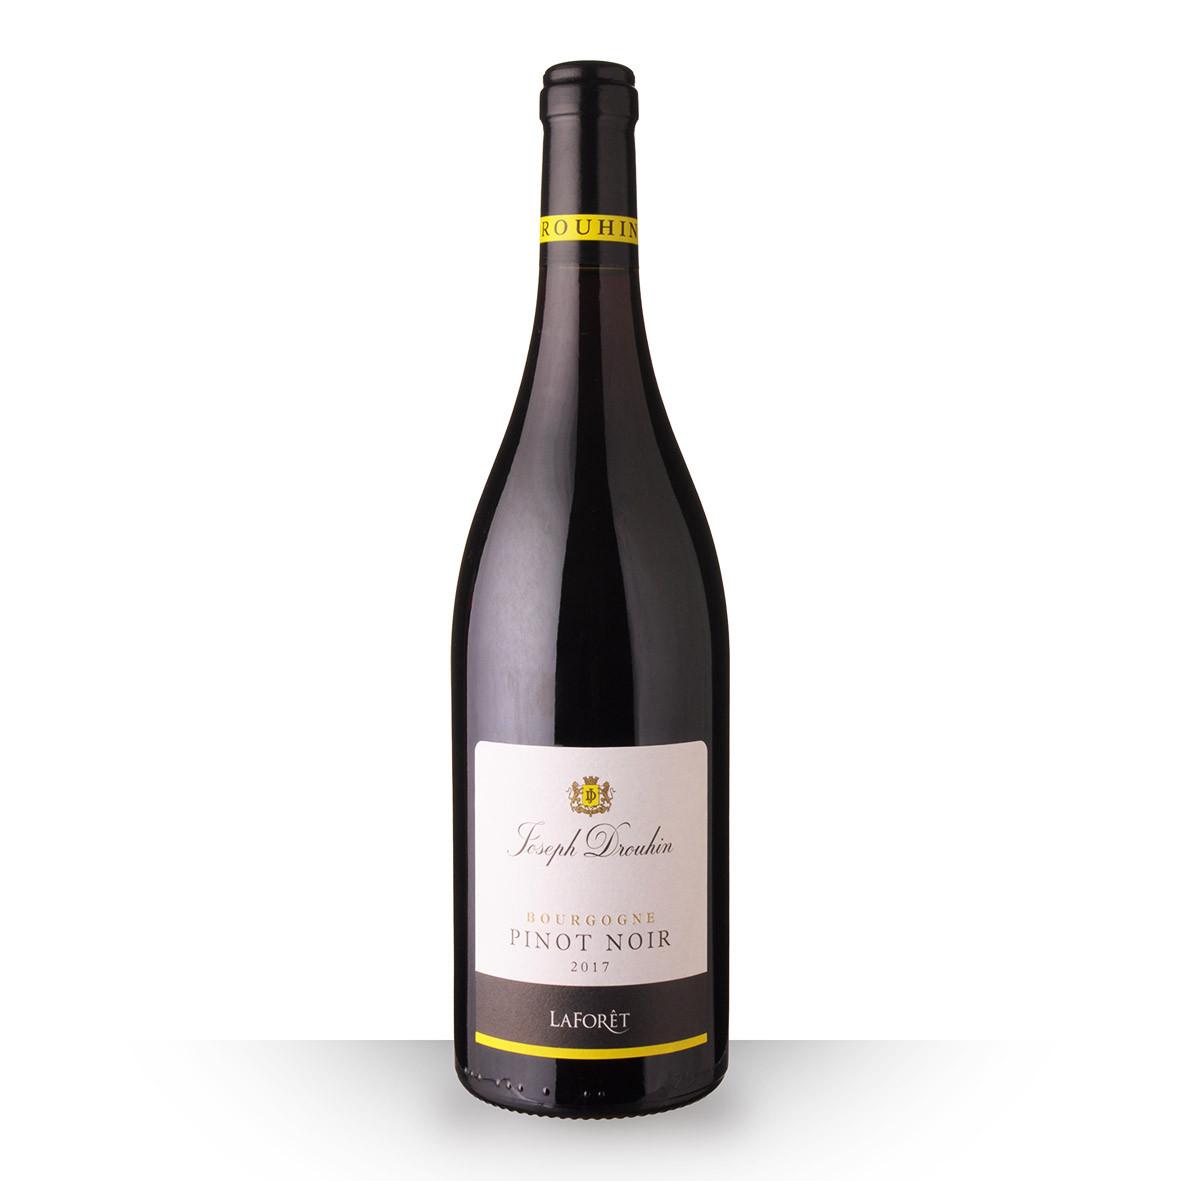 Joseph Drouhin Bourgogne Pinot Noir Rouge 2017 75cl www.odyssee-vins.com